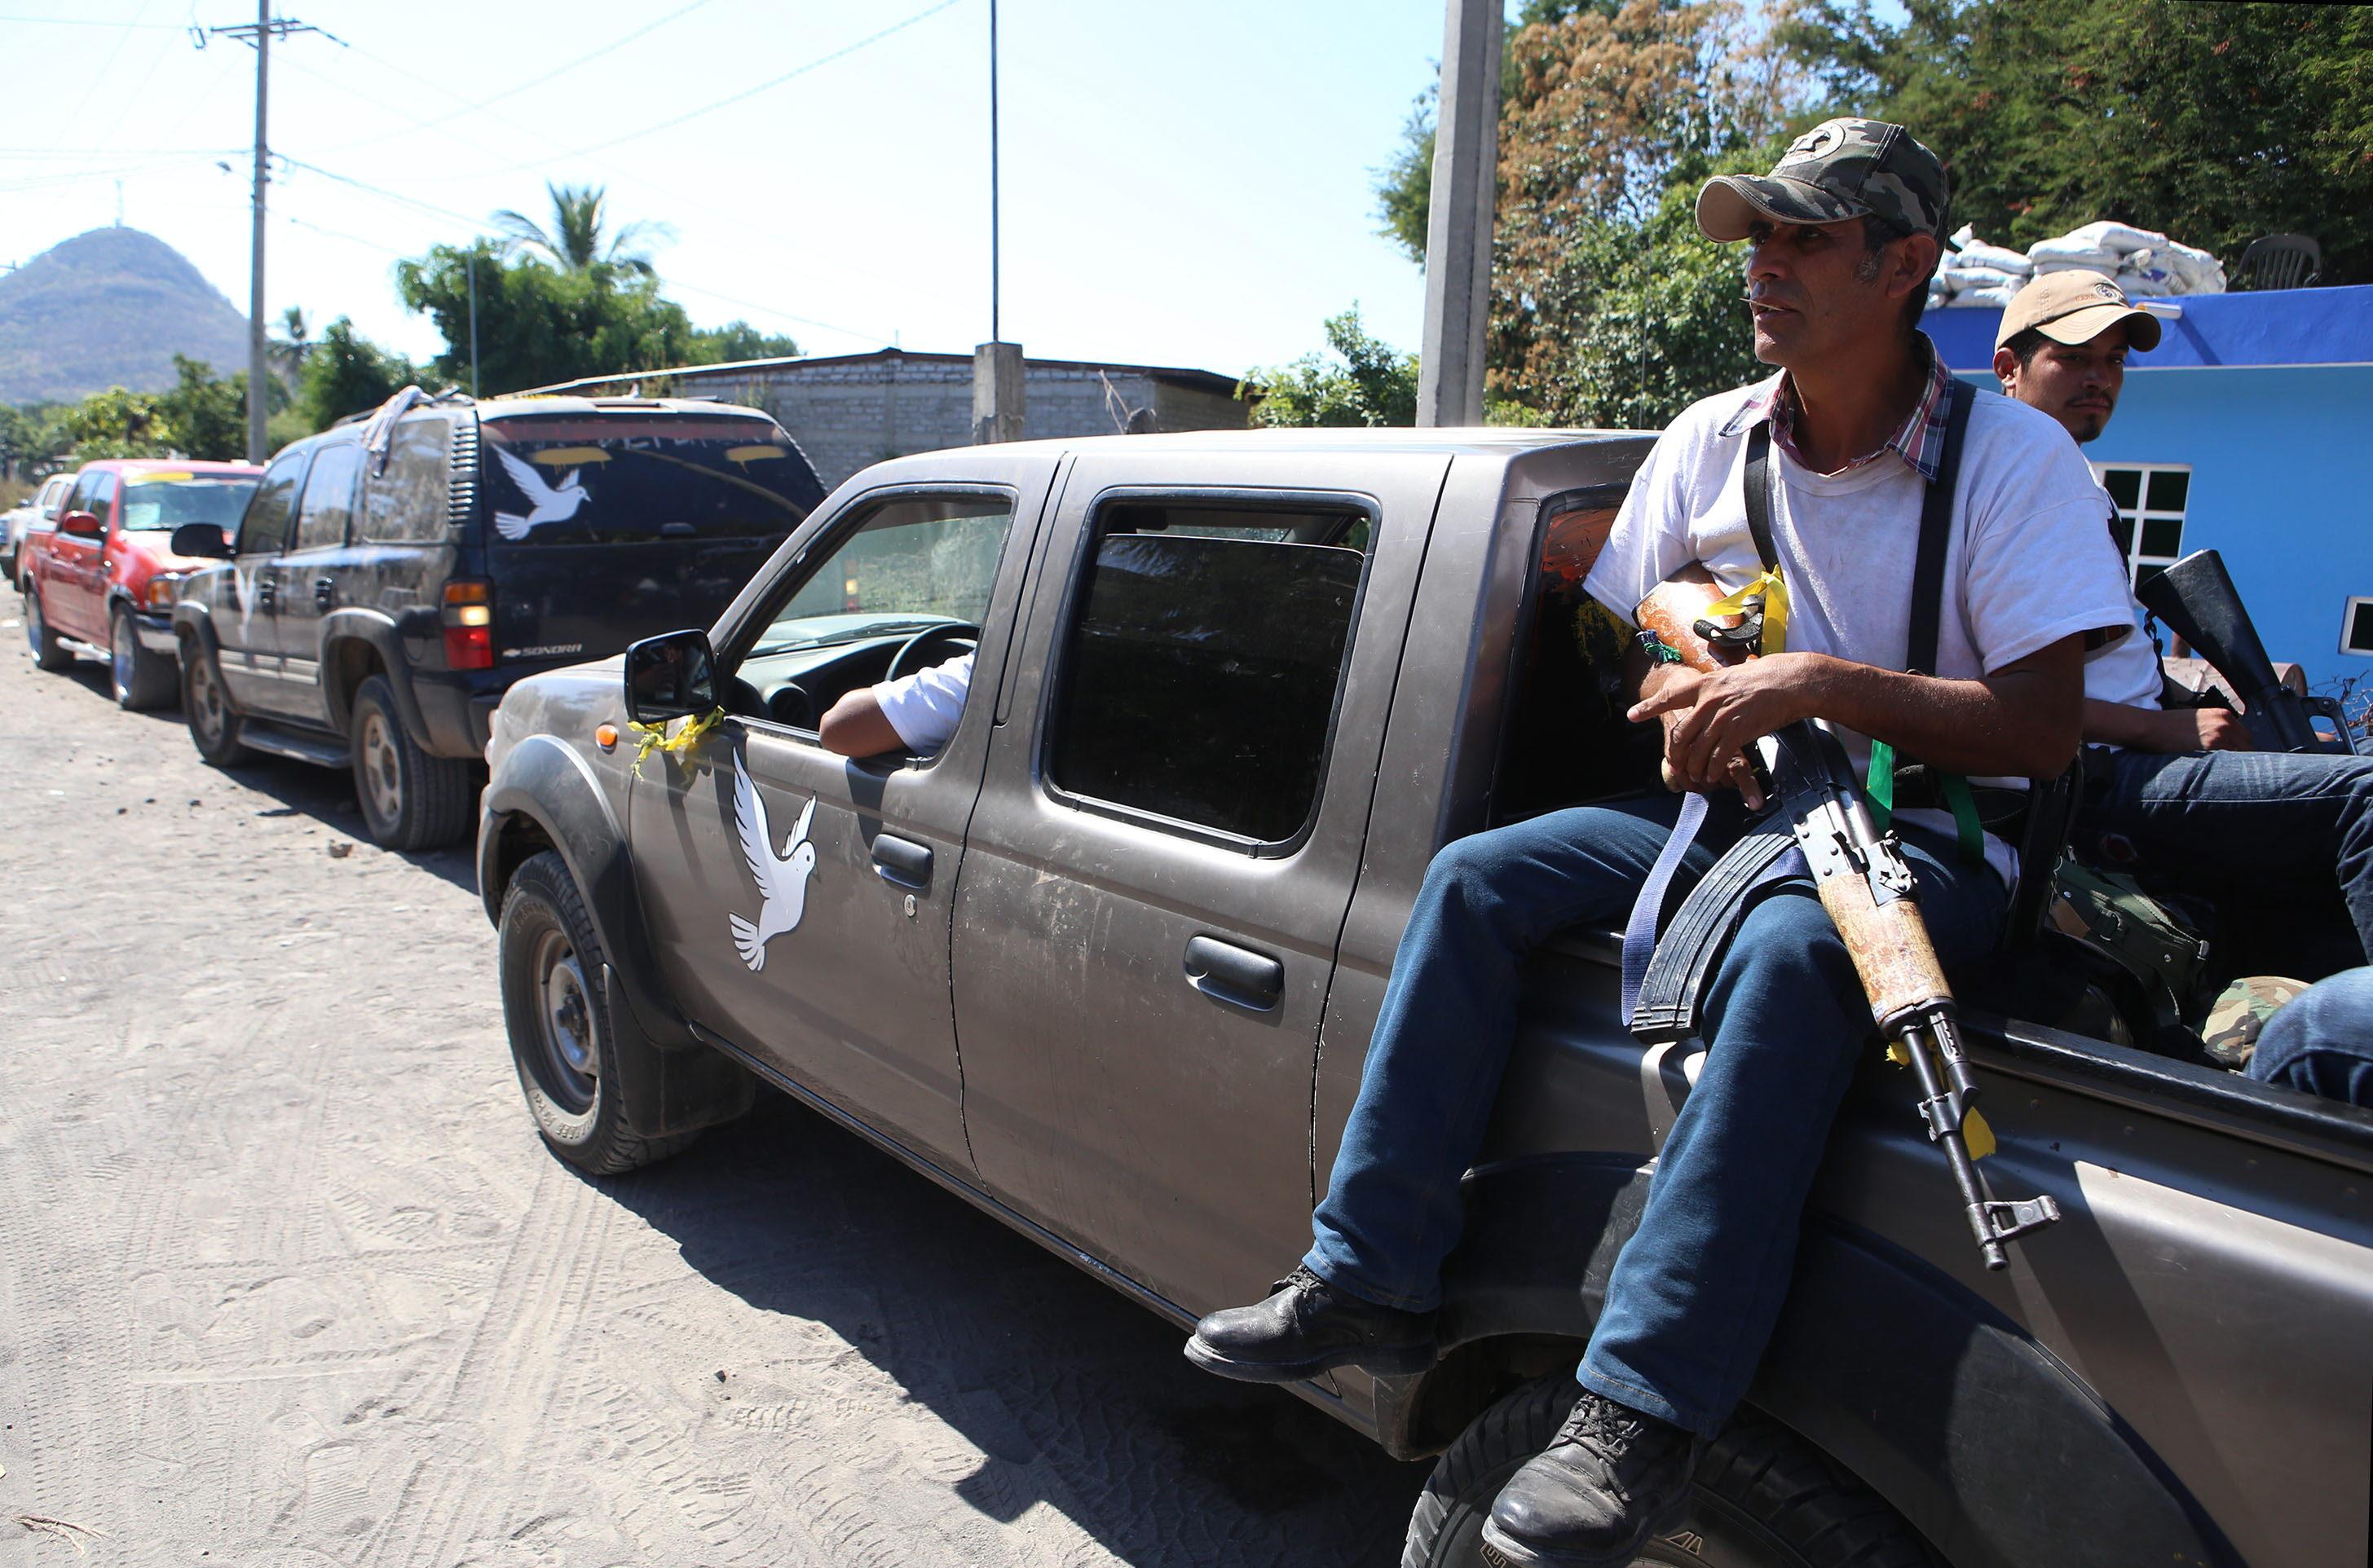 Mexican vigilantes search caves for Knights Templar leader